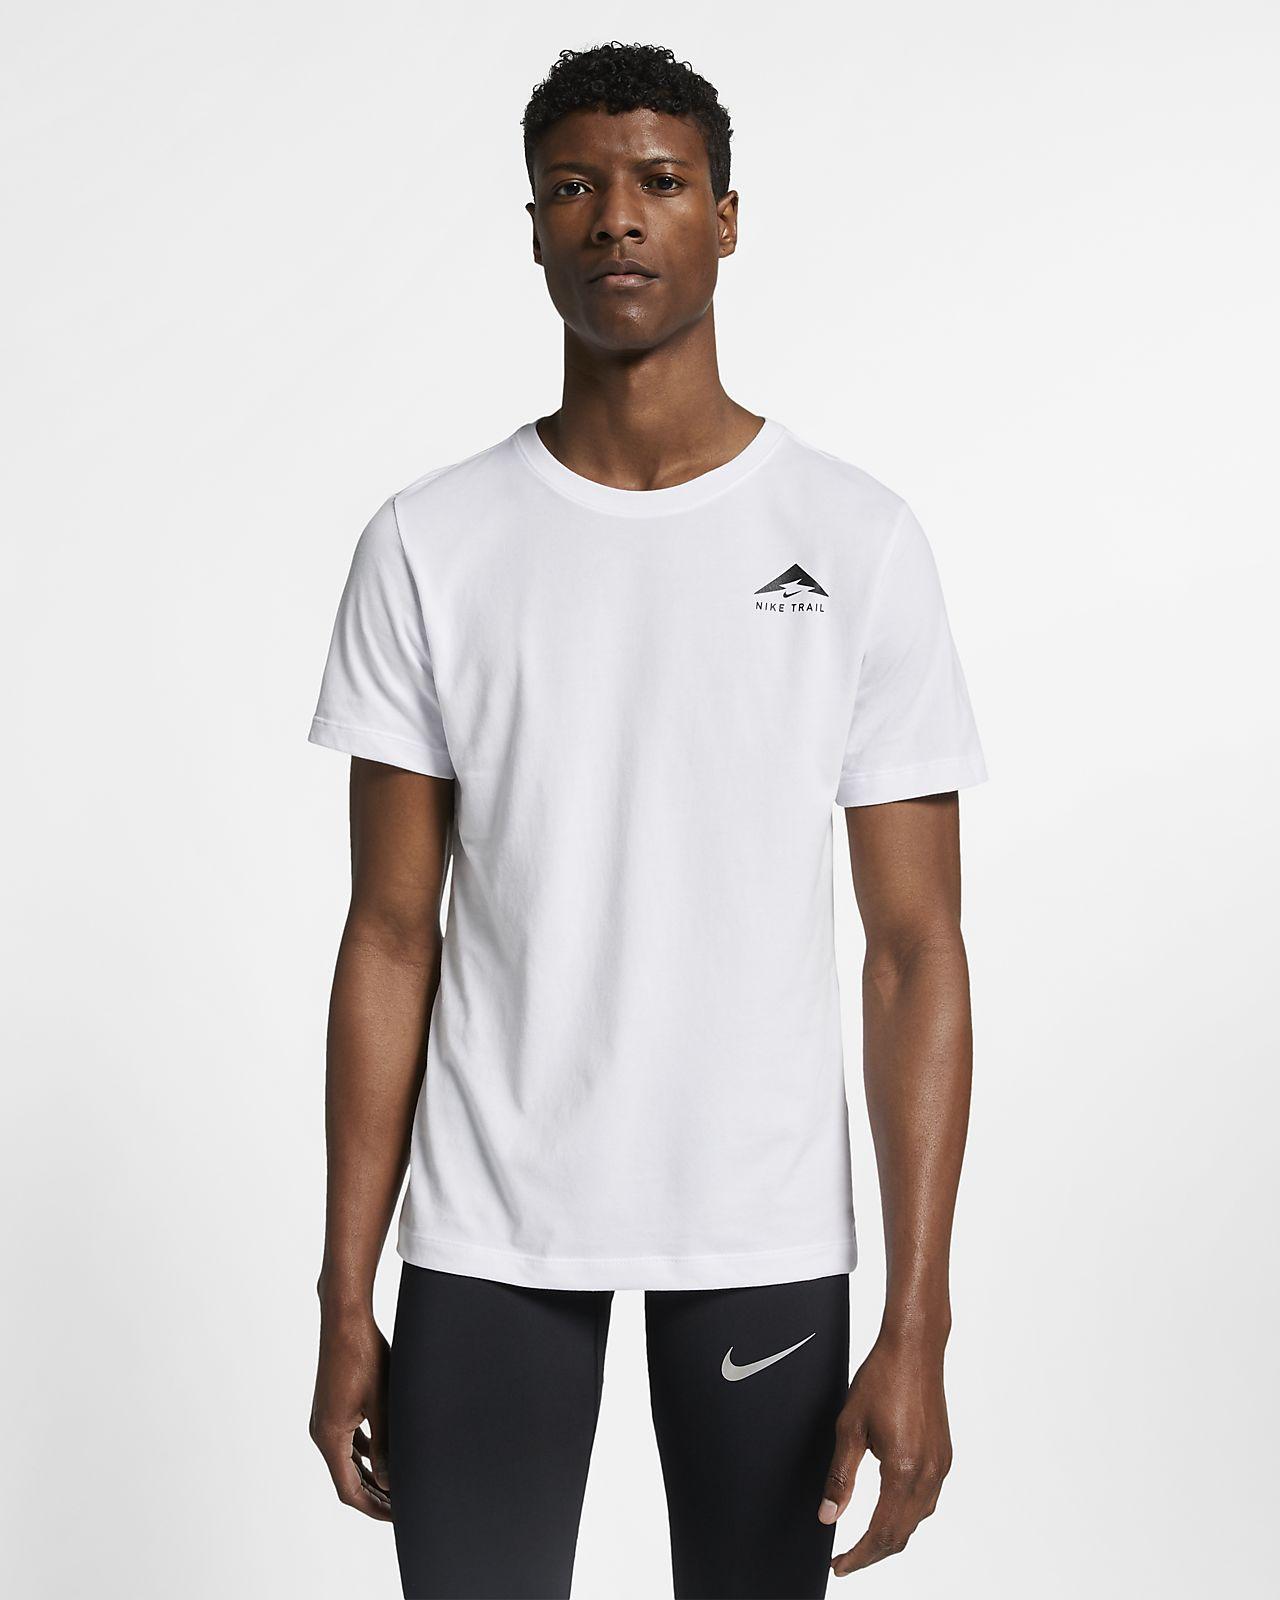 Nike Trail Dri-FIT Camiseta de running - Hombre